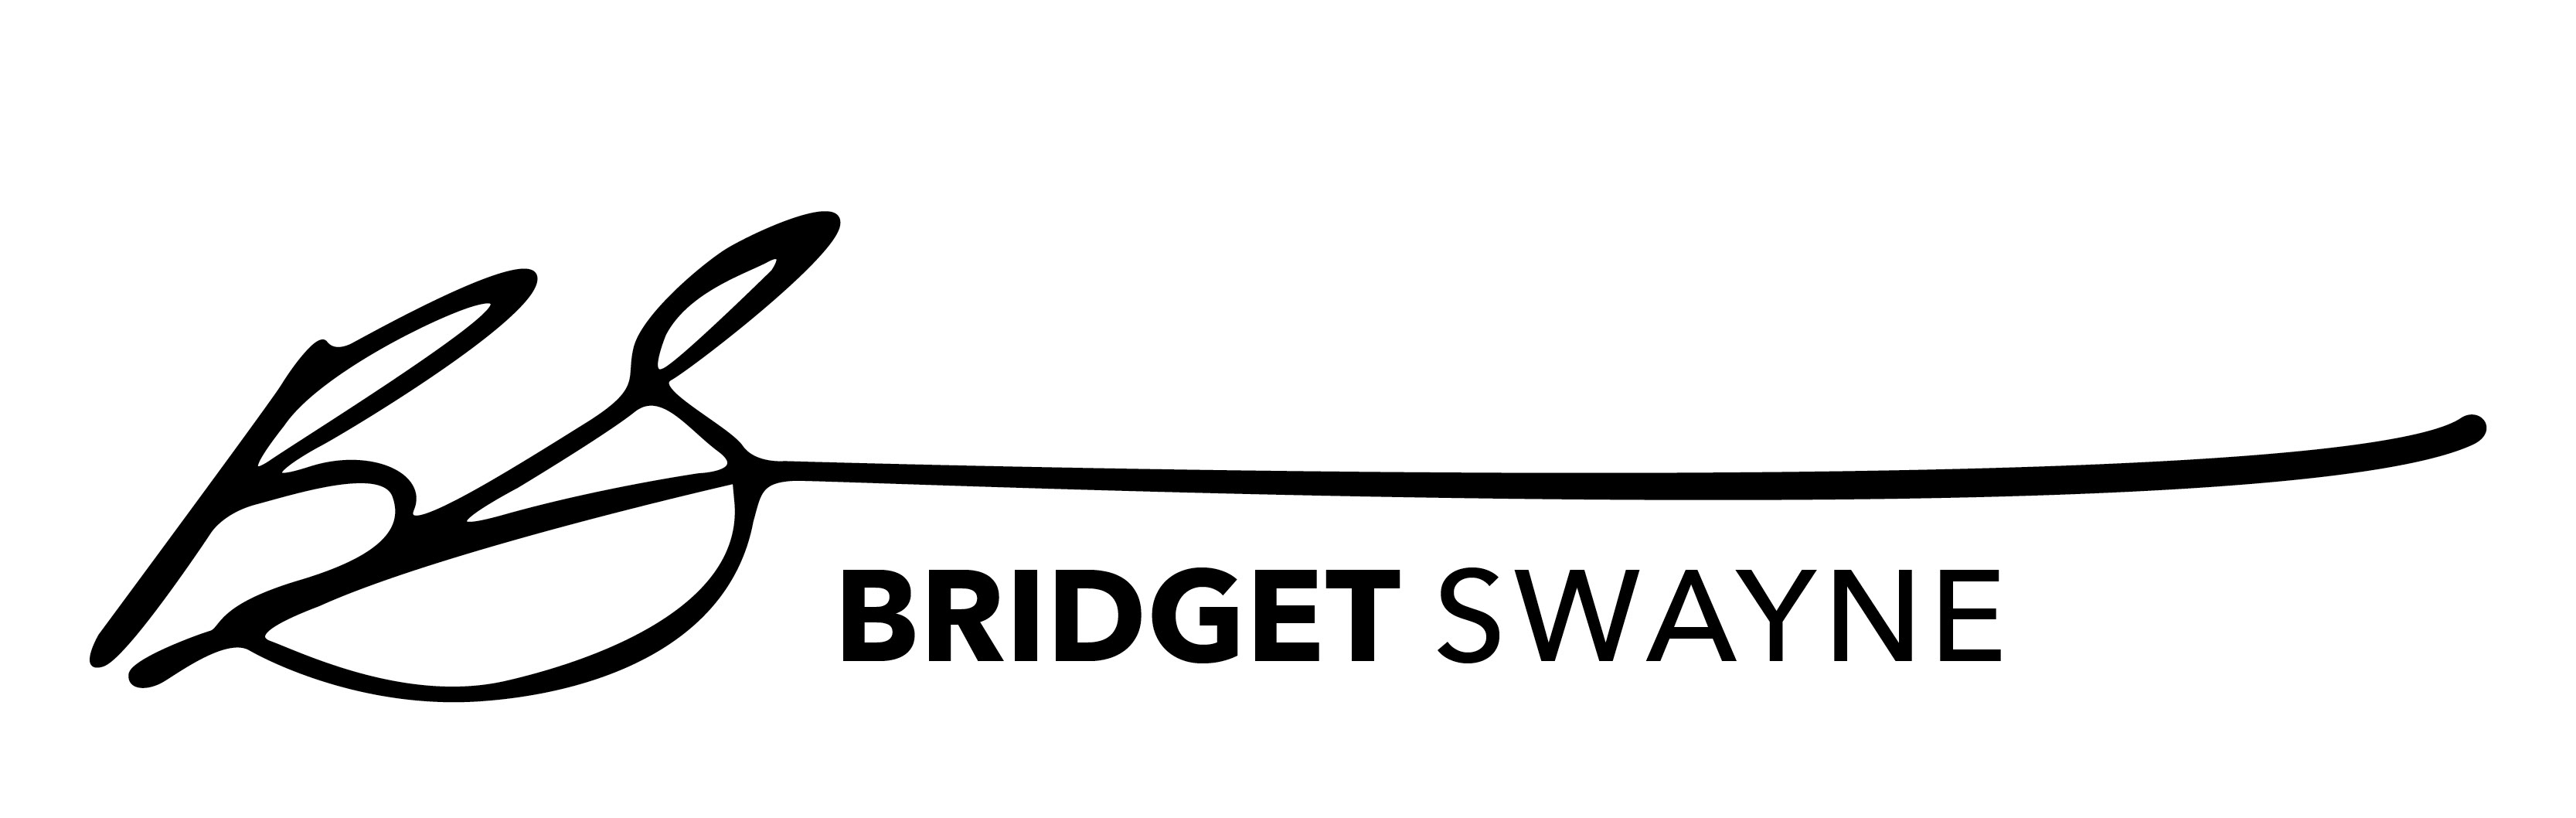 Bridget Swayne